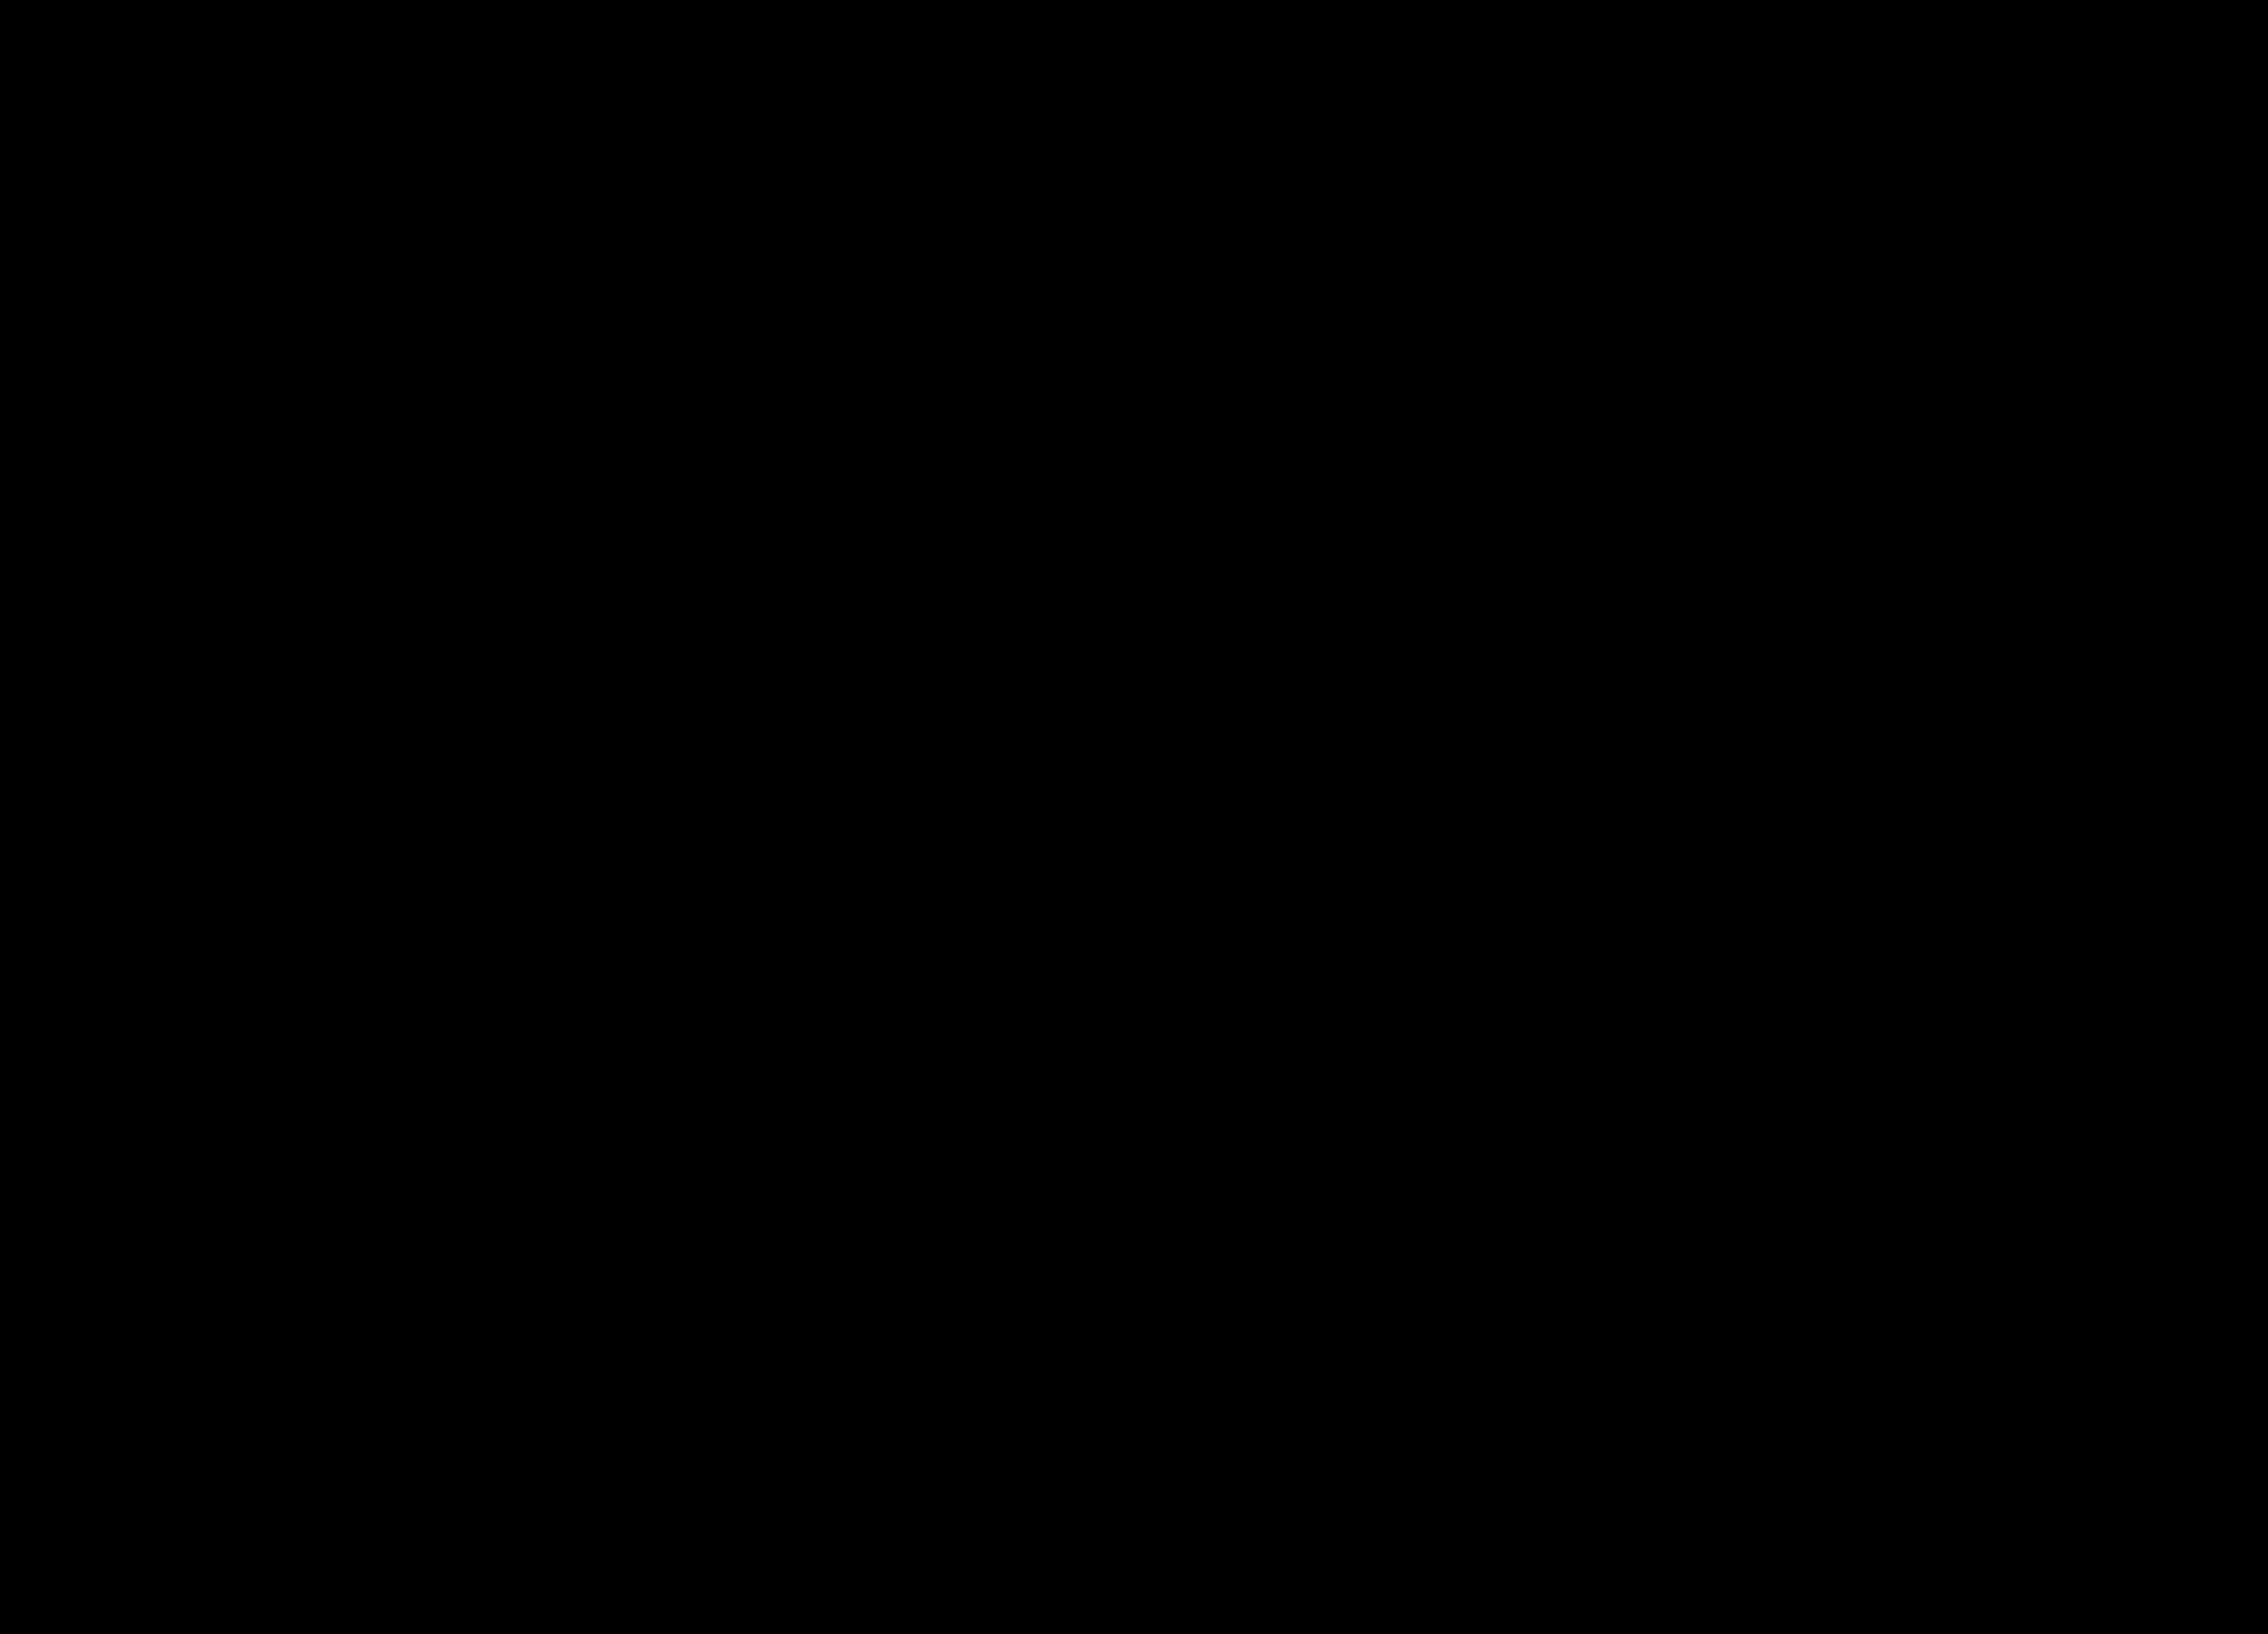 2356x1697 Clipart